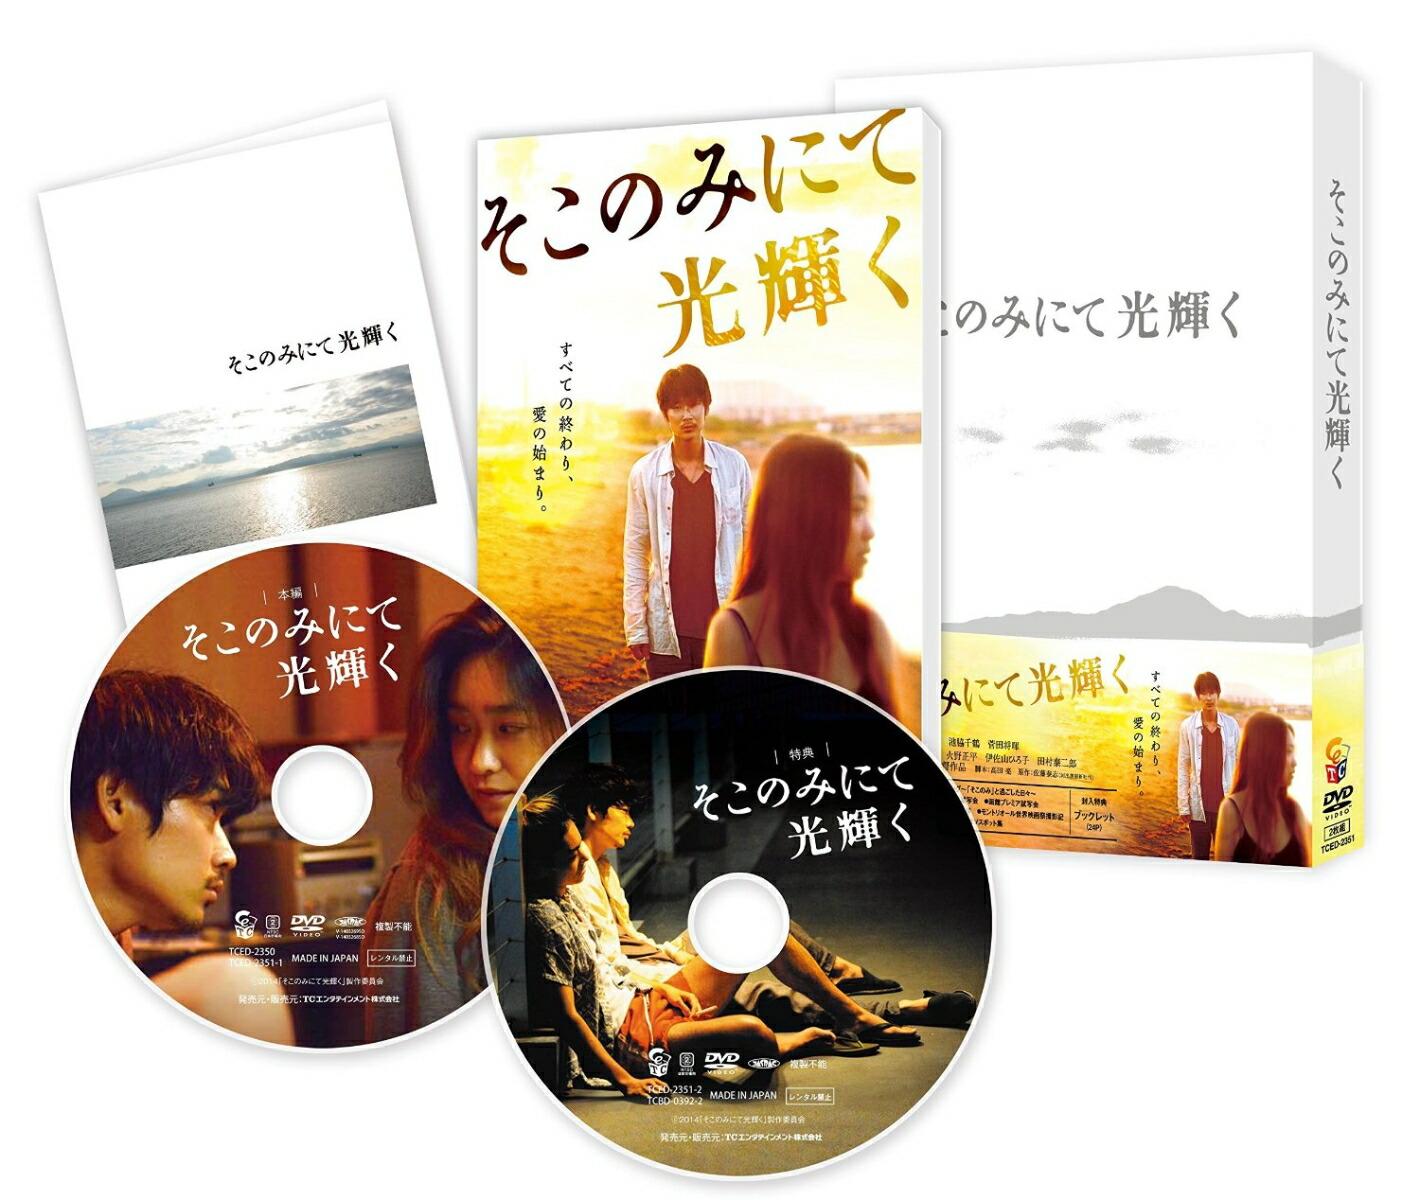 �����݂̂ɂČ��P�� ���ؔŁyDVD�z[TCED-2351][DVD]